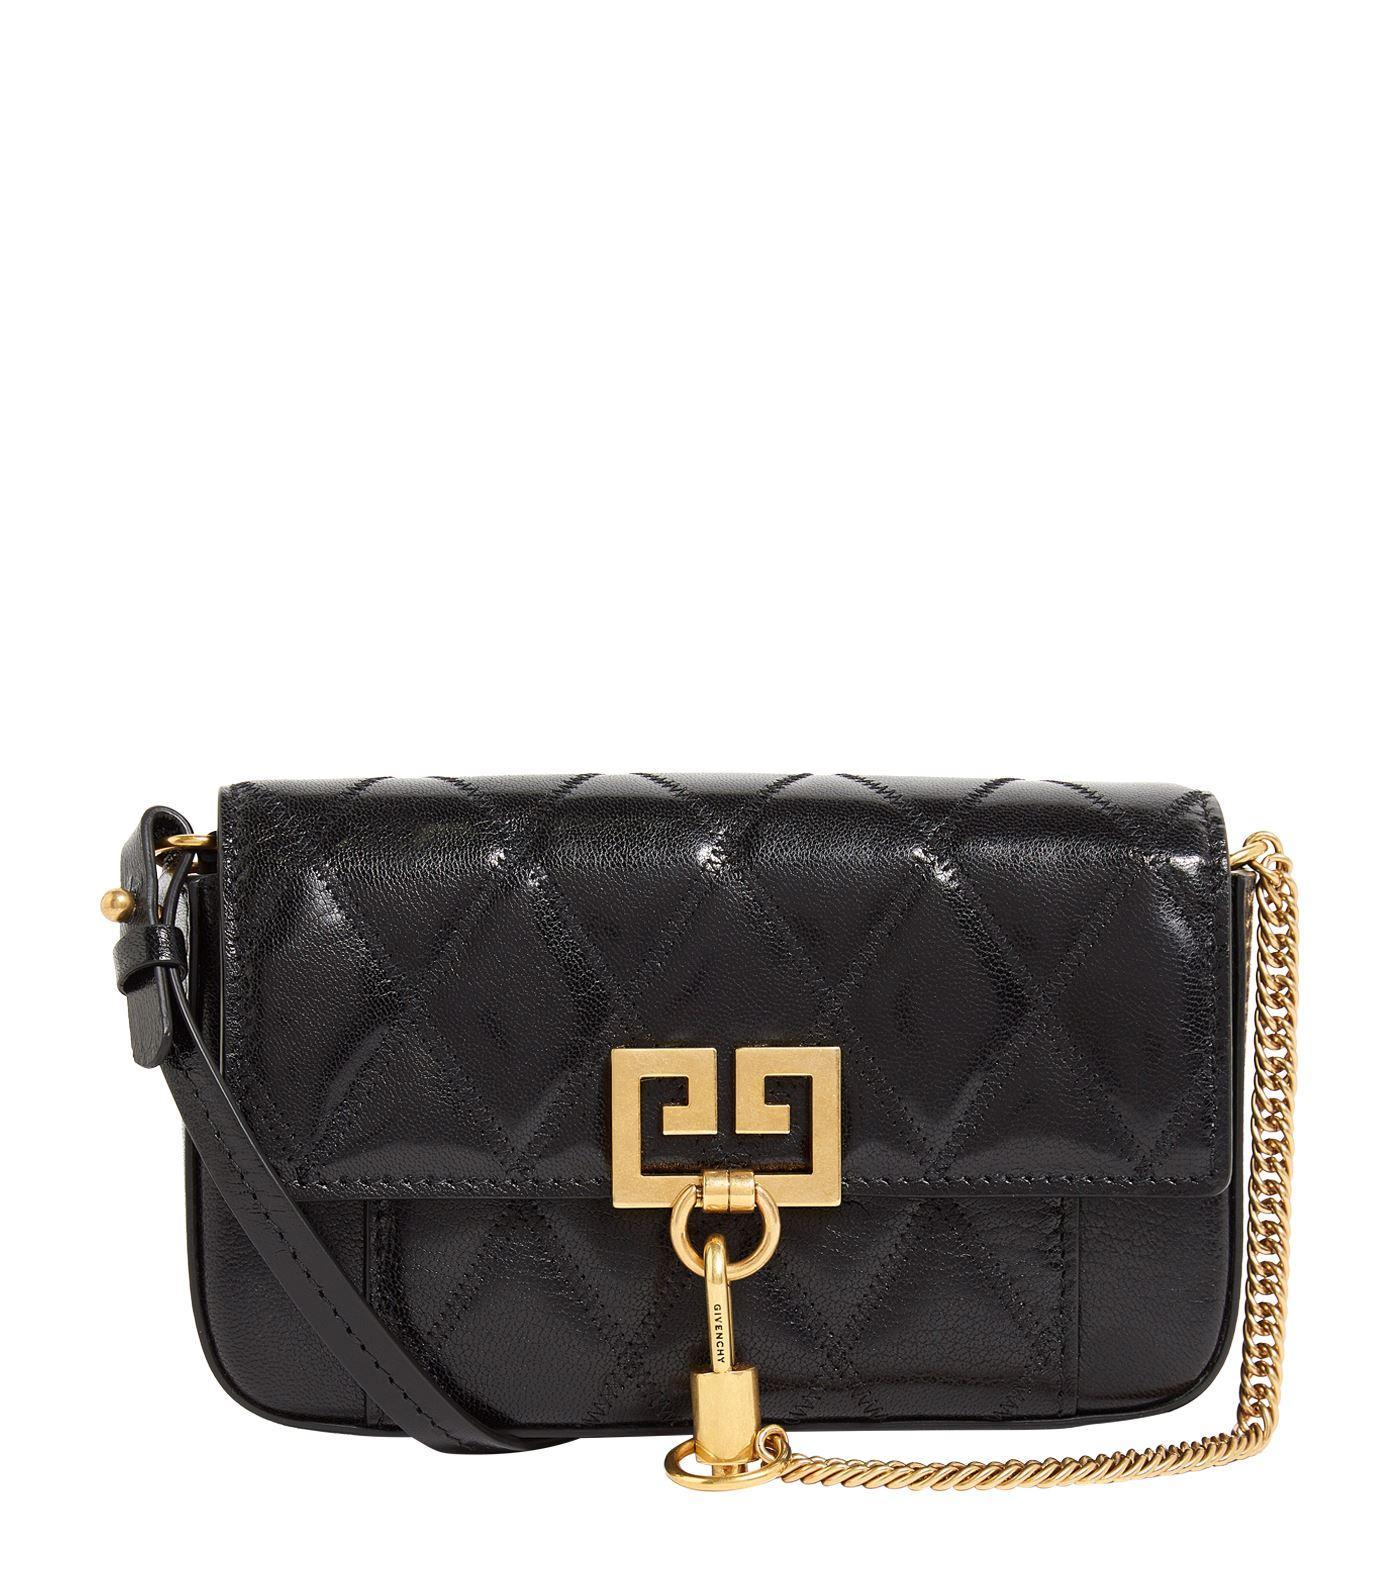 288ea45edd7 Givenchy - Black Mini Leather Pocket Pouch Bag - Lyst. View fullscreen